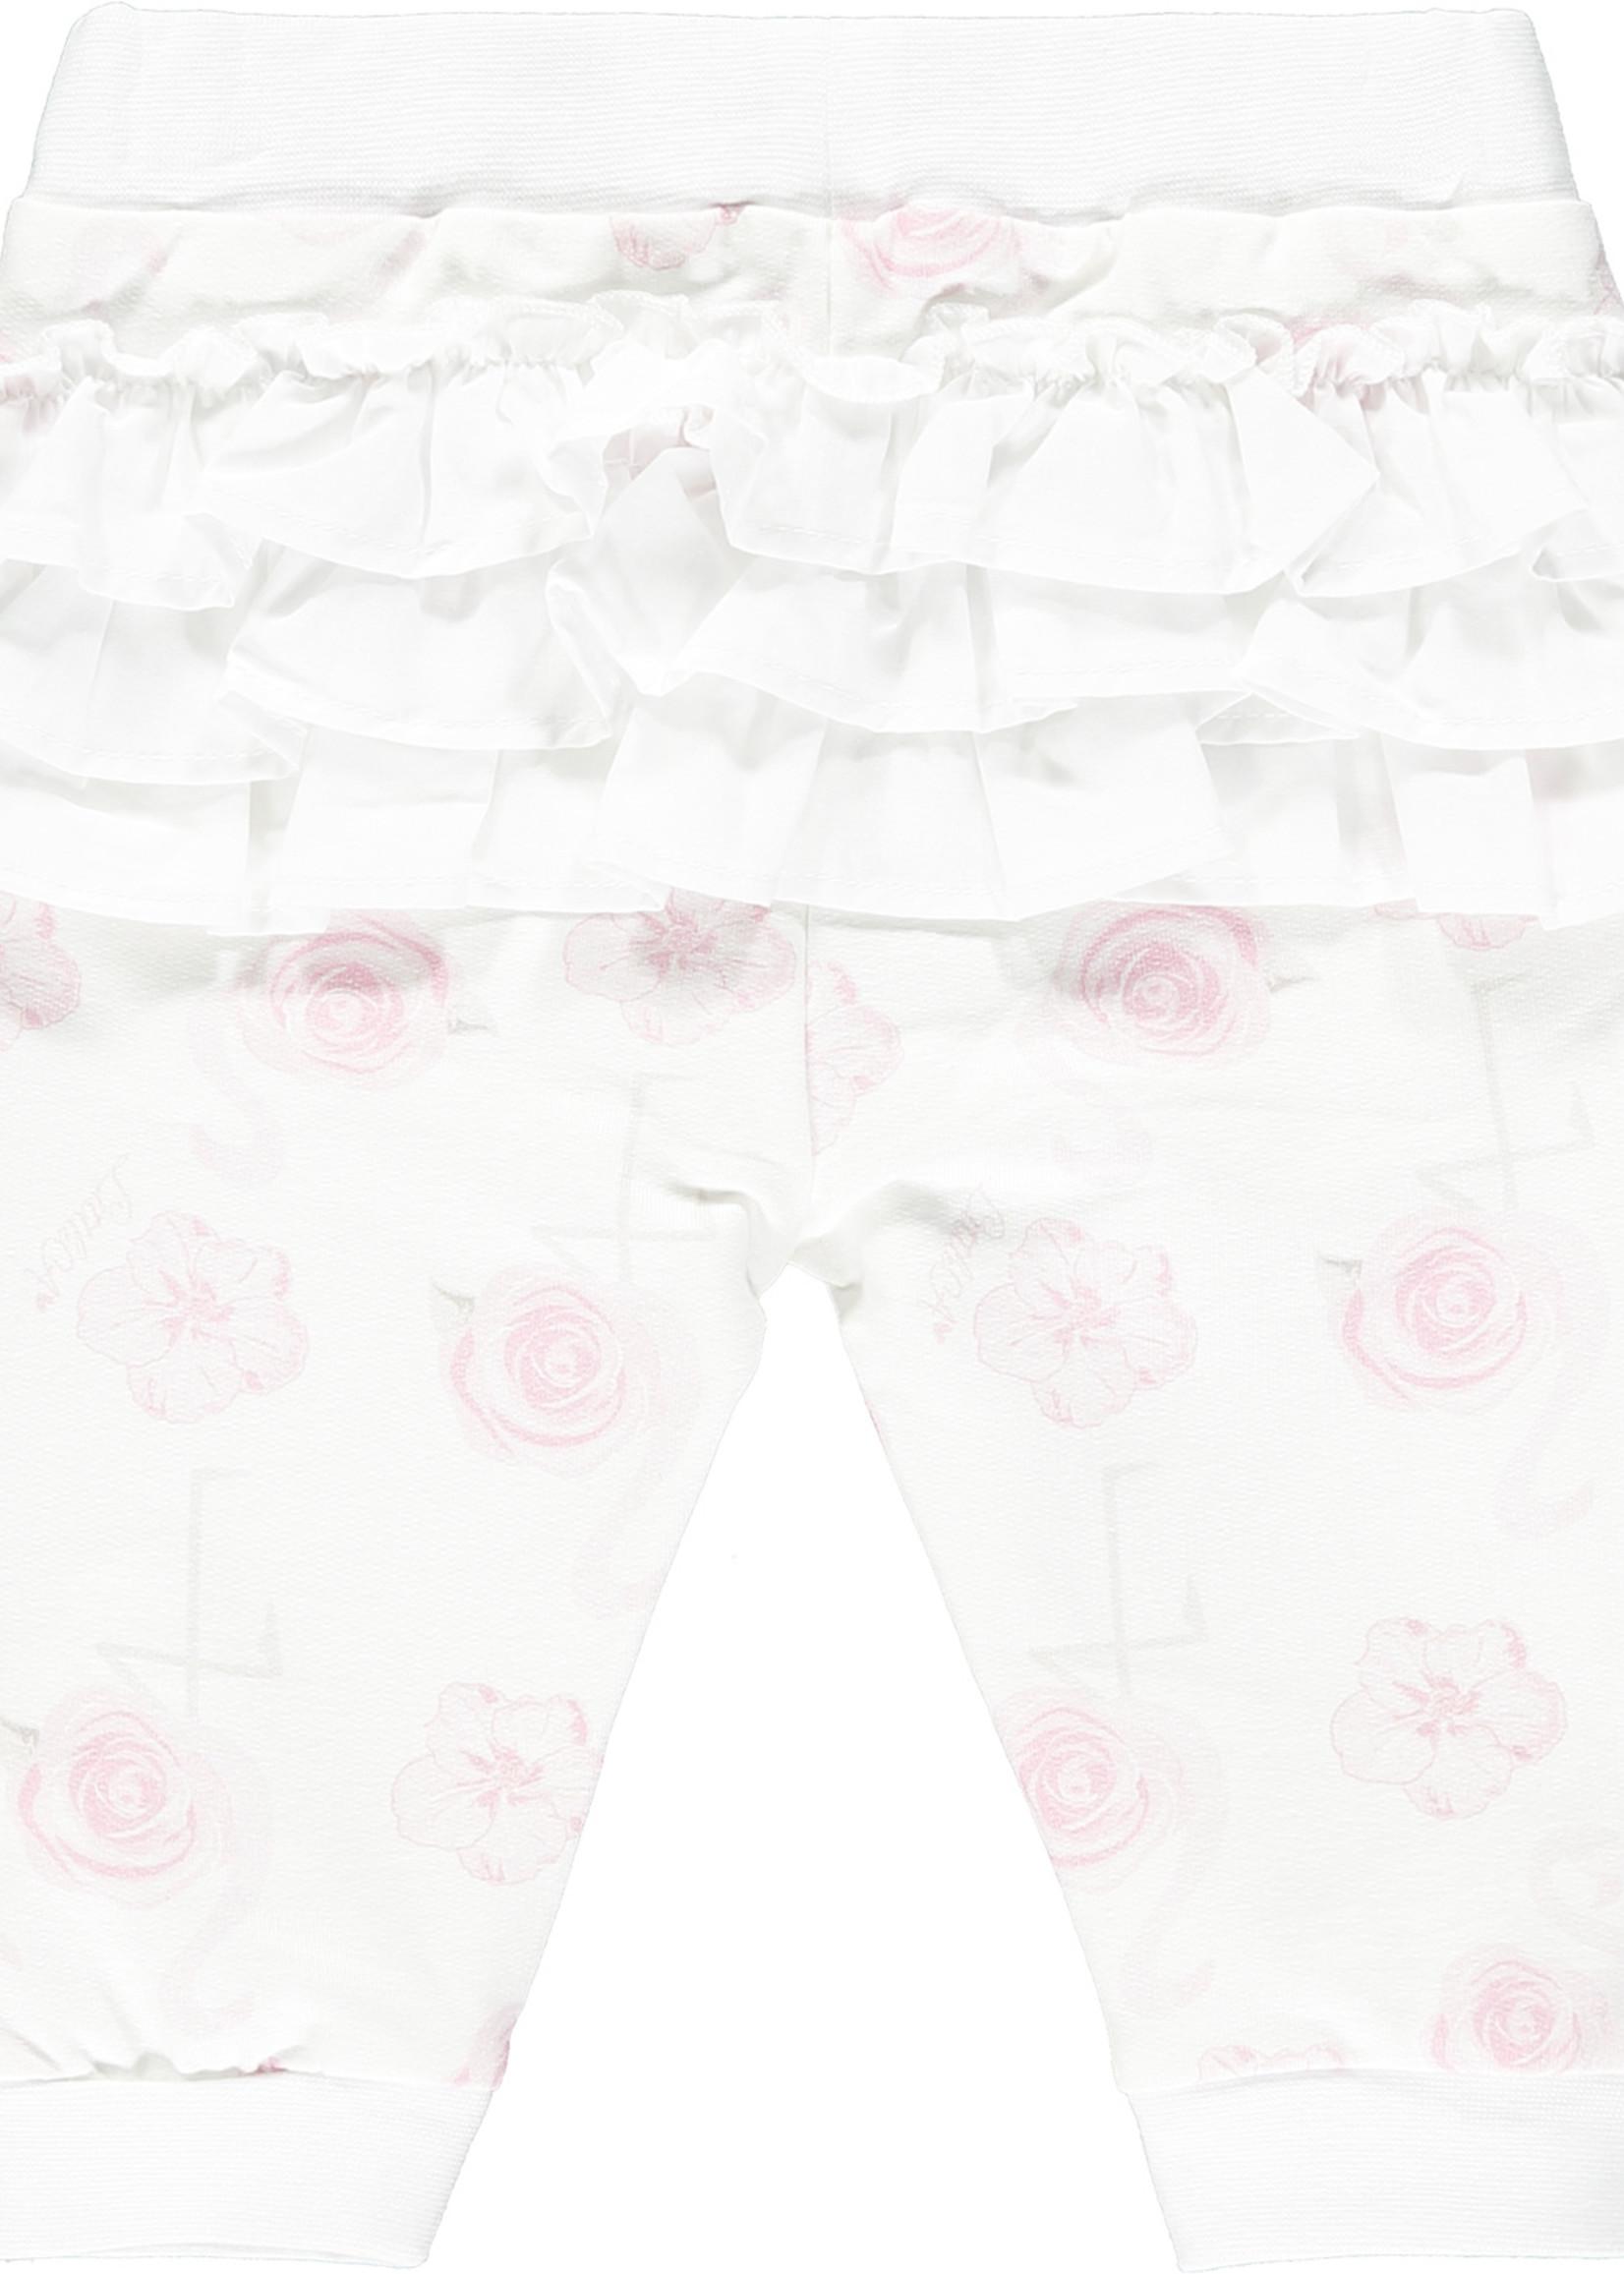 Little Adee Jaqueline Flamingo print tracksuit